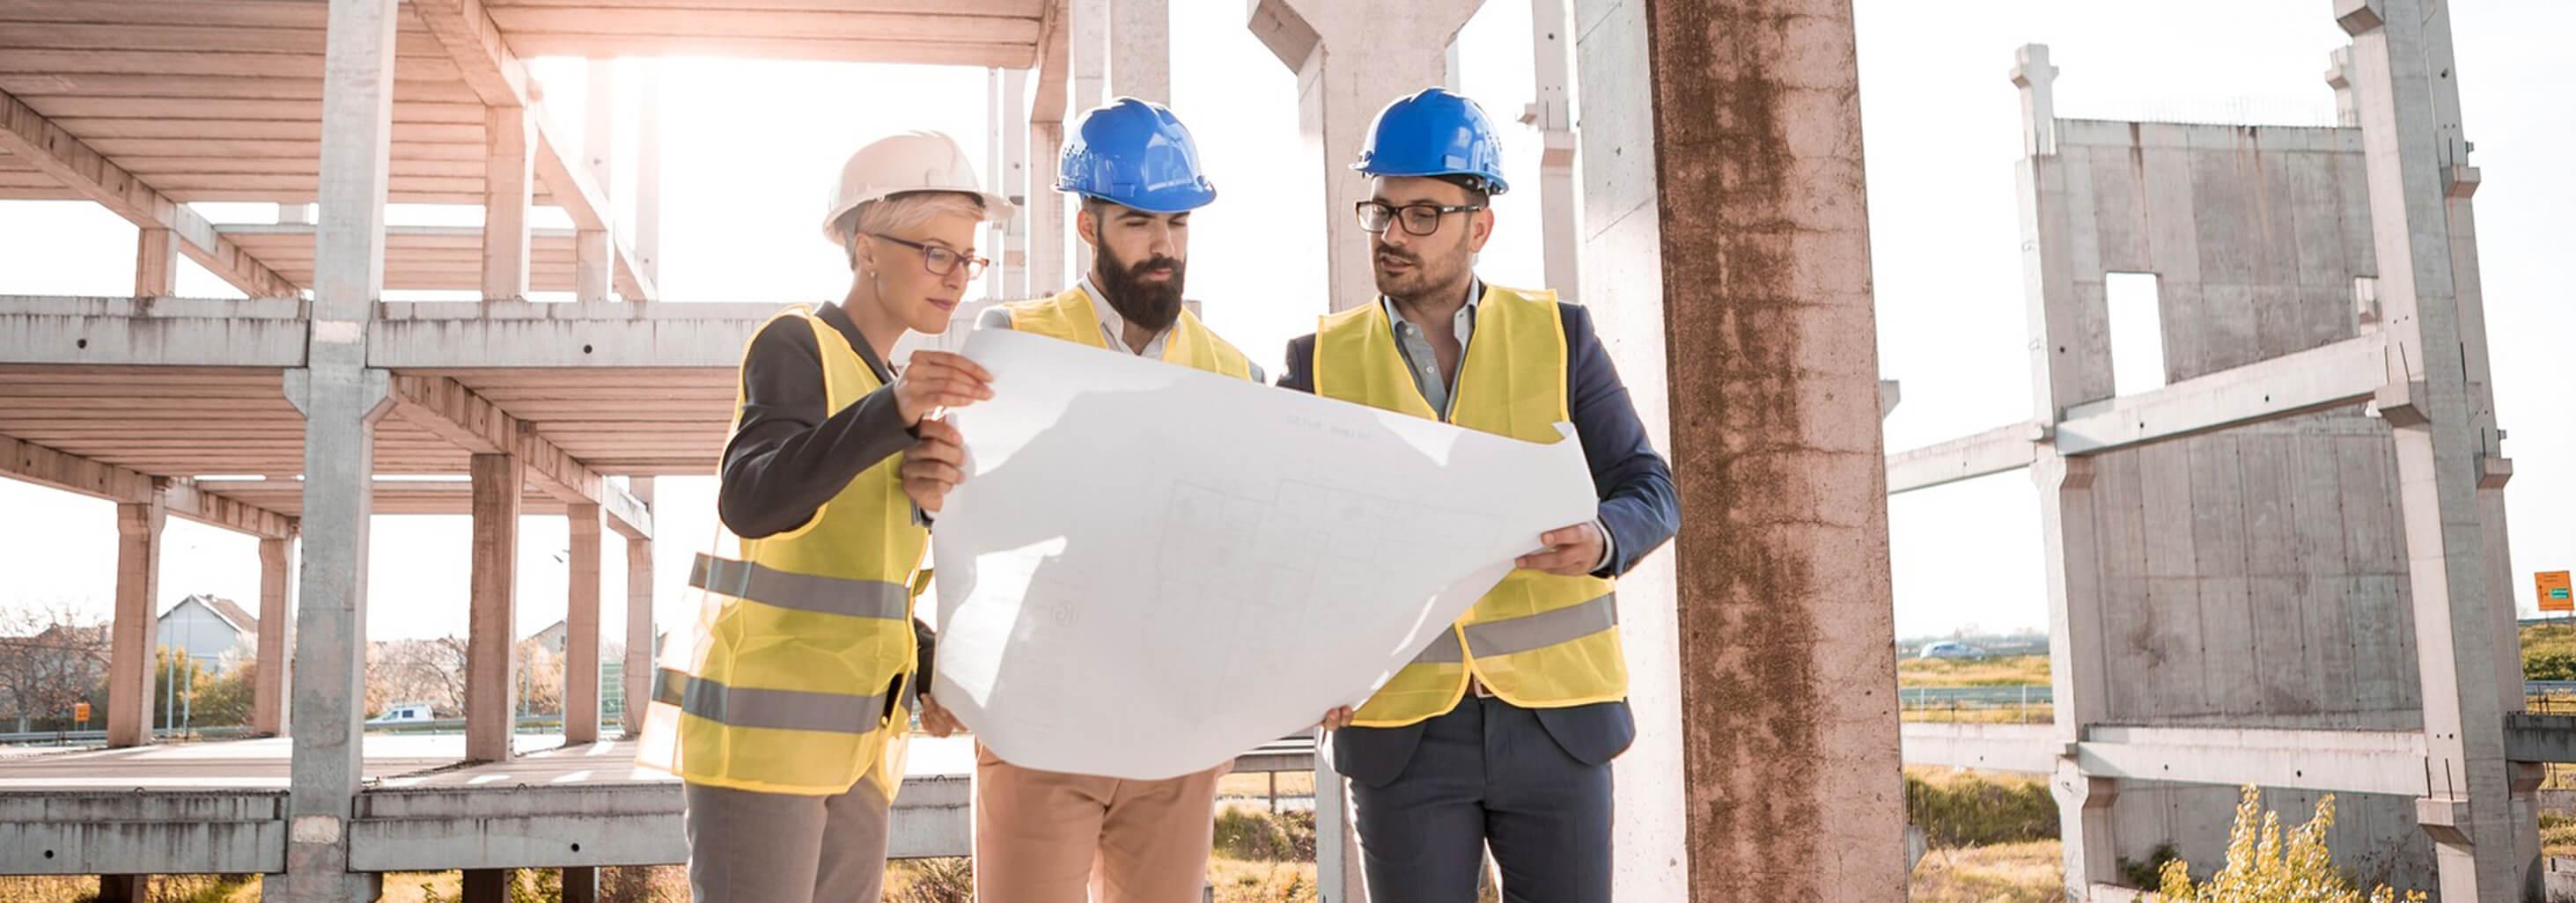 Construction Site Management Course Imagery